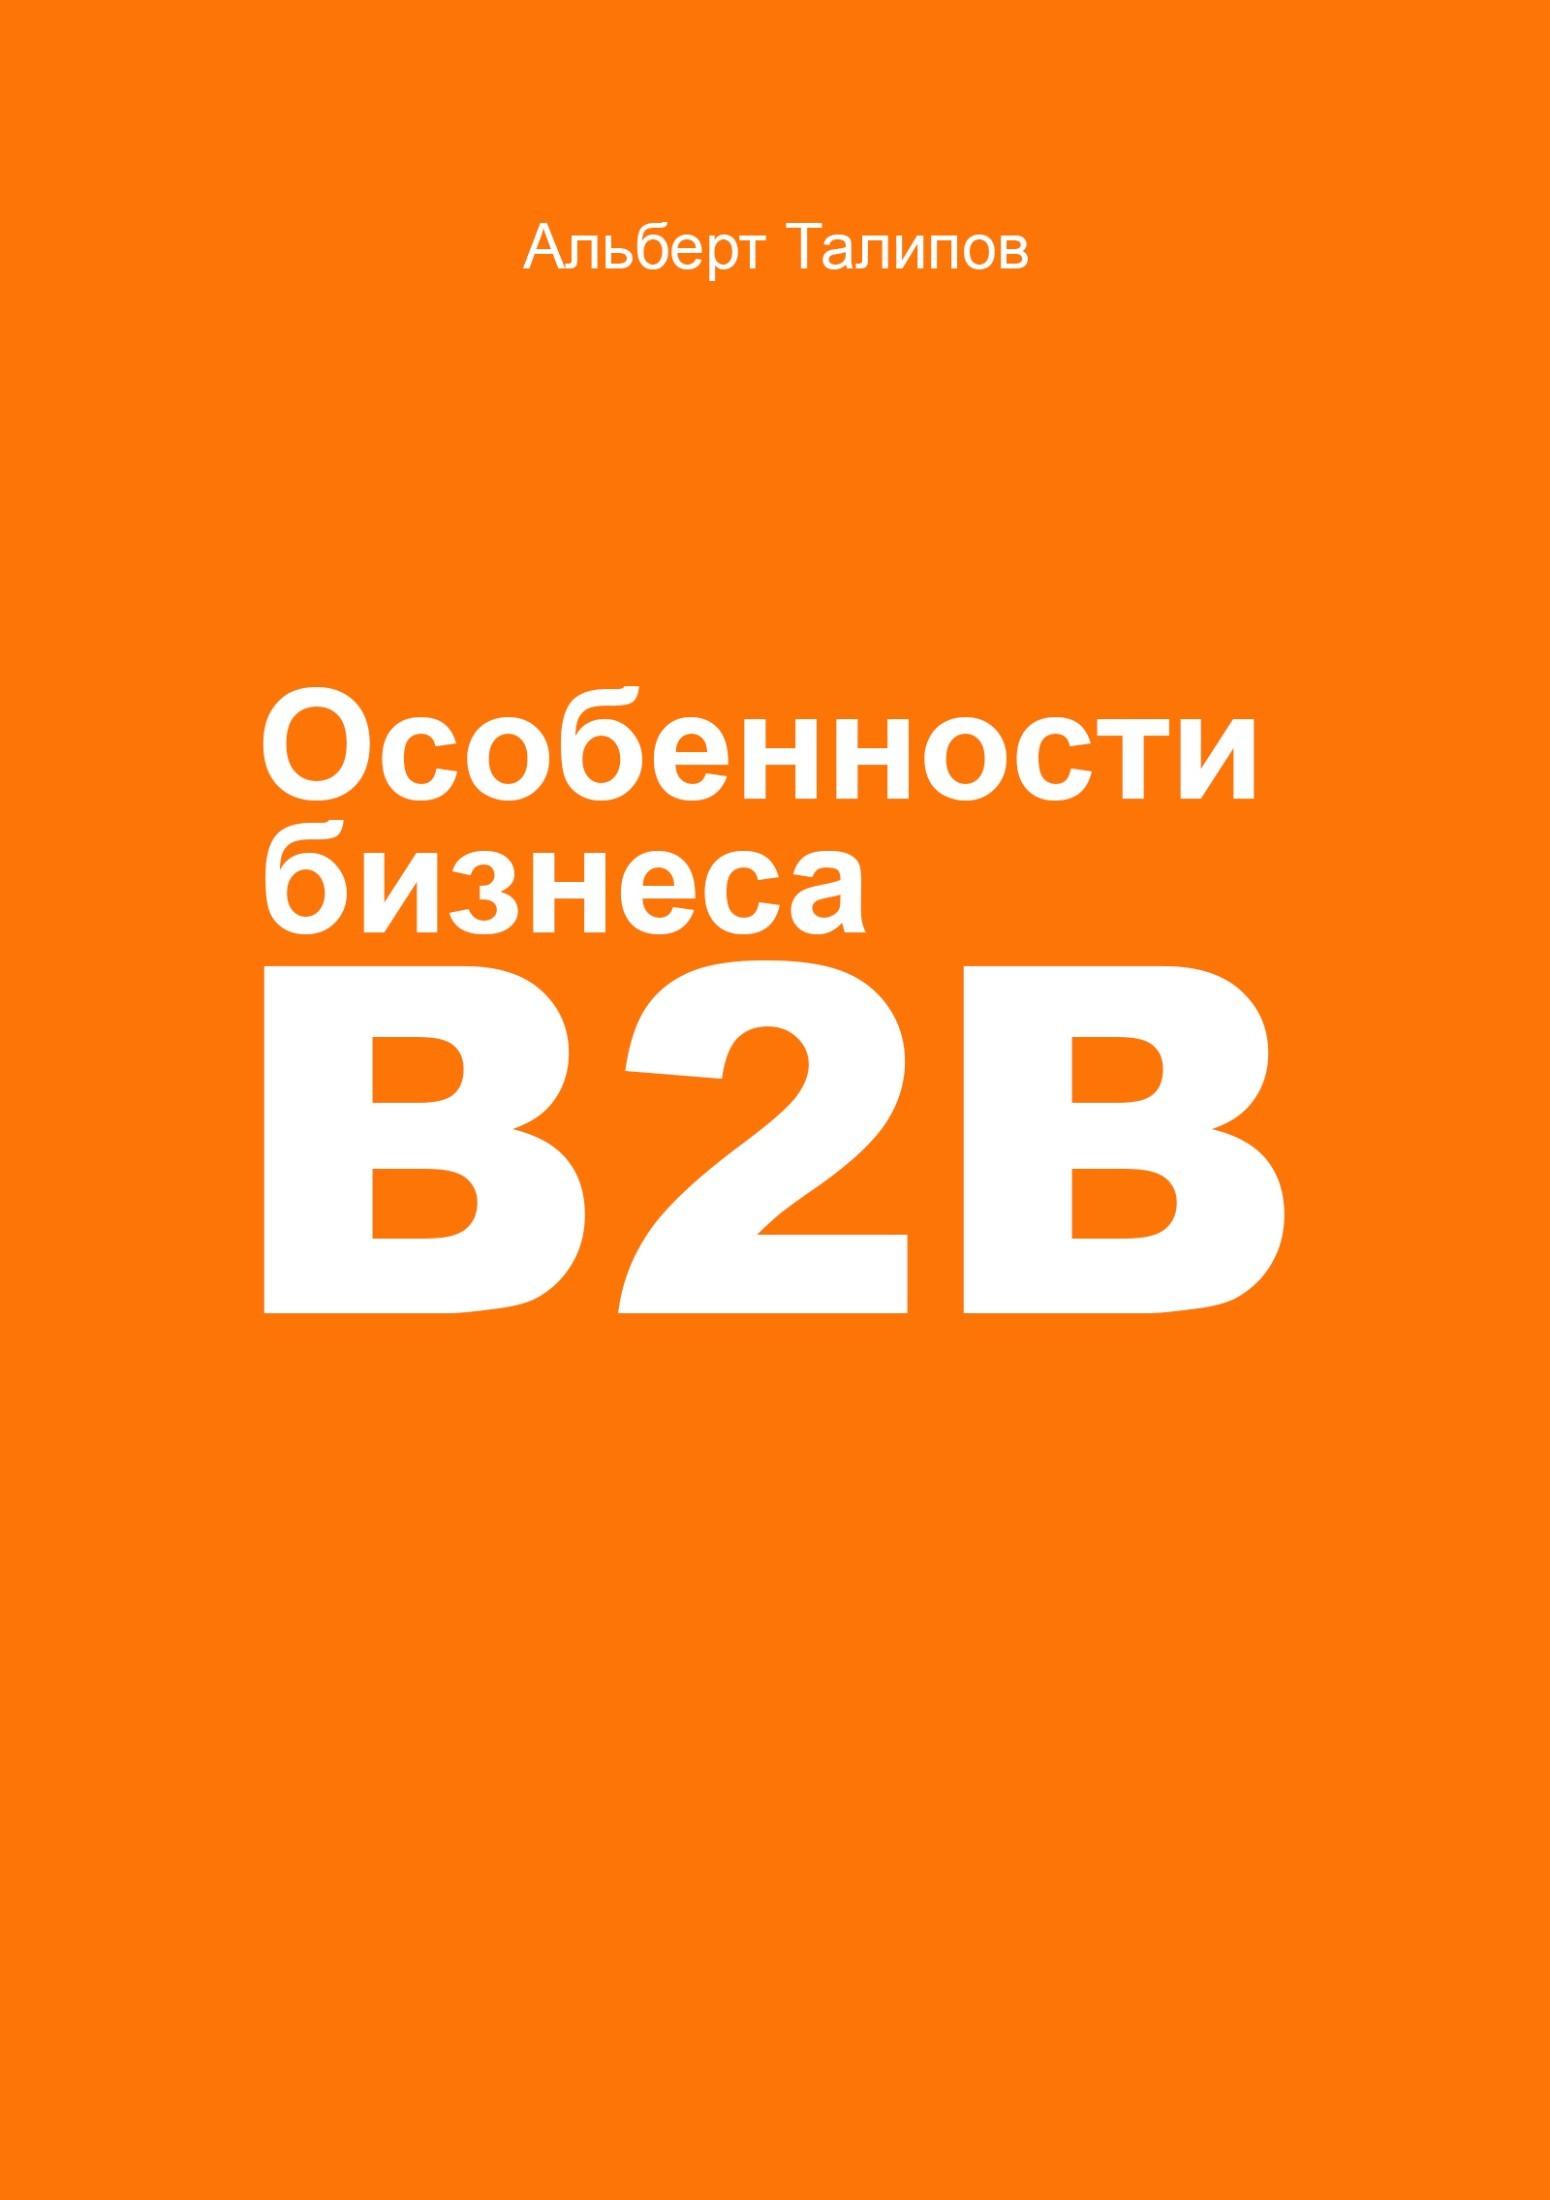 Альберт Талипов Особенности бизнеса b2b